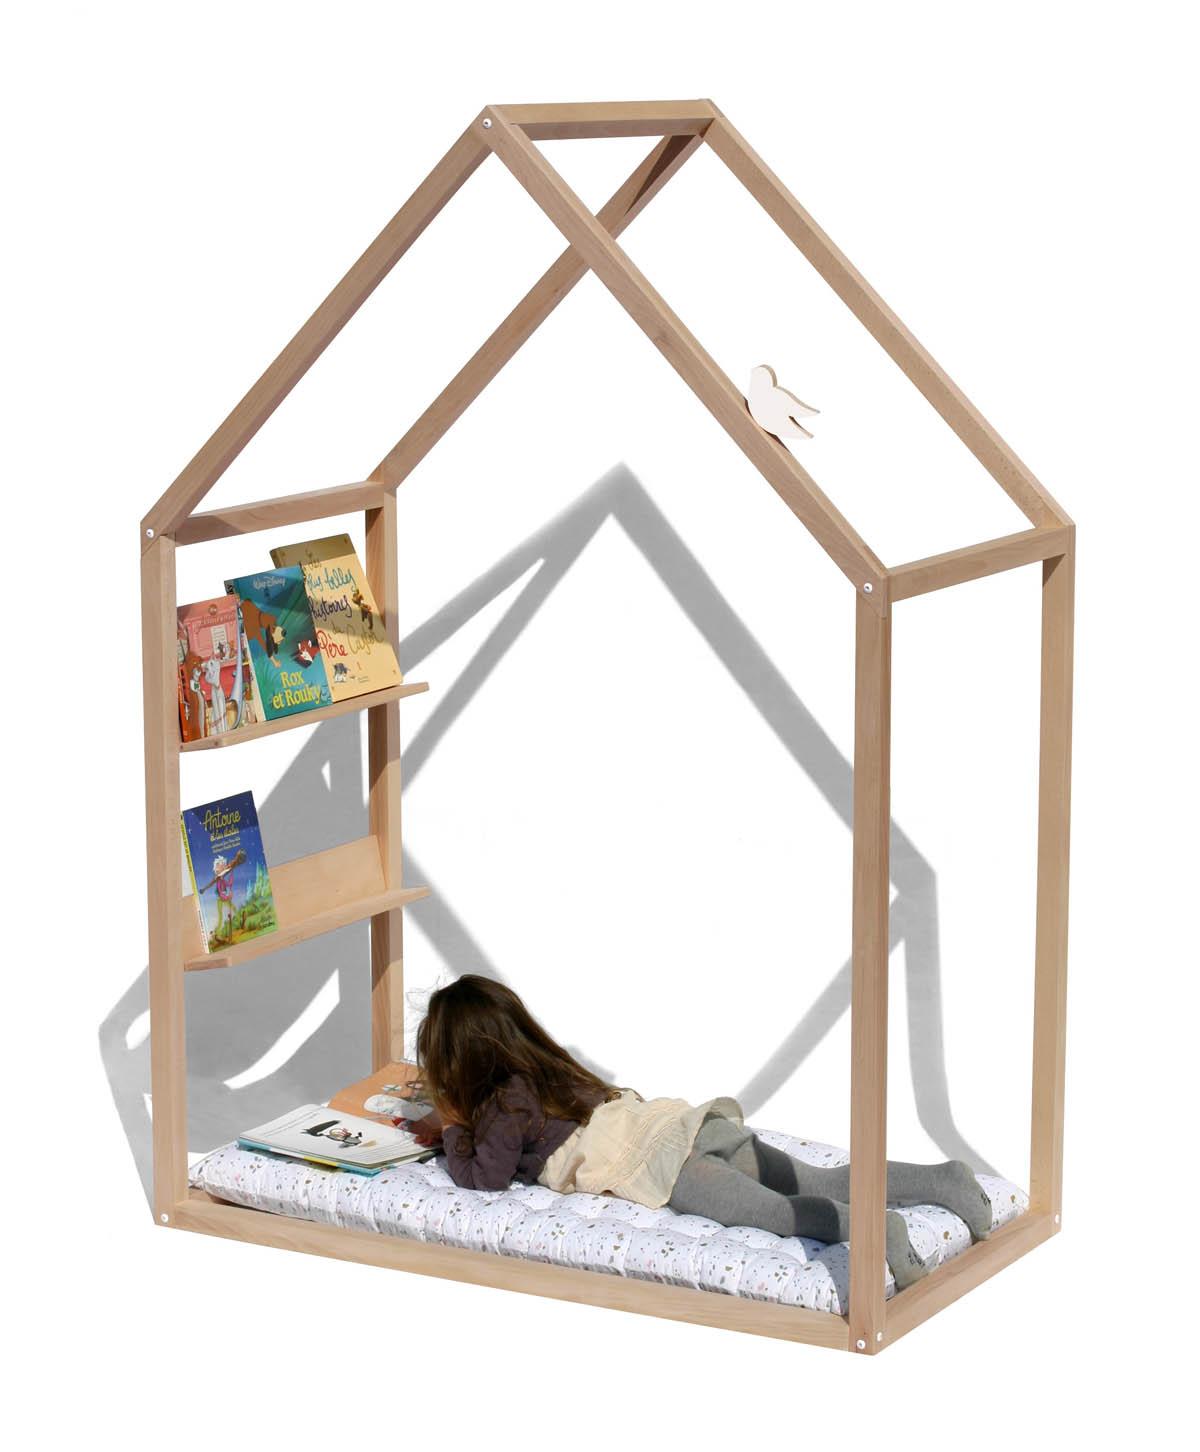 cabane bois bibliotheque enfant